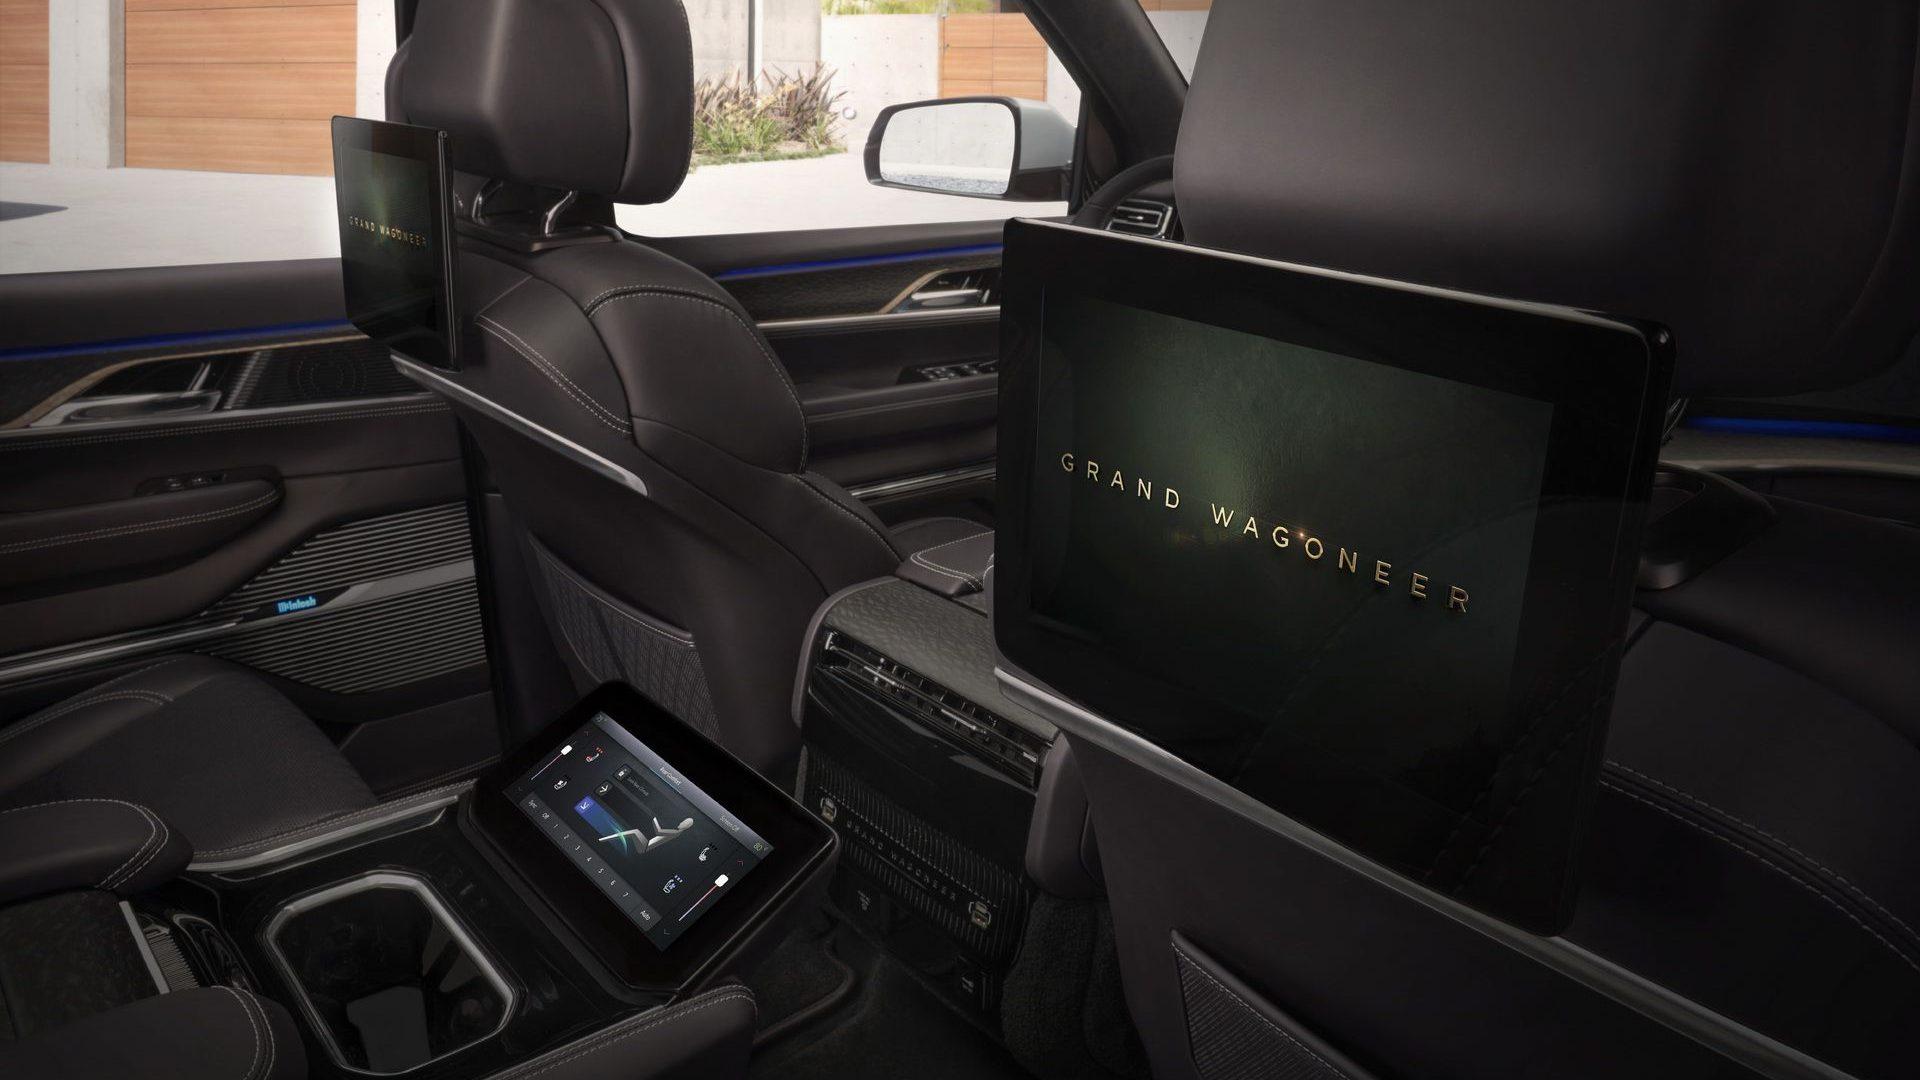 2020-Jeep-Grand-Wagoneer-Concept-Interior-06